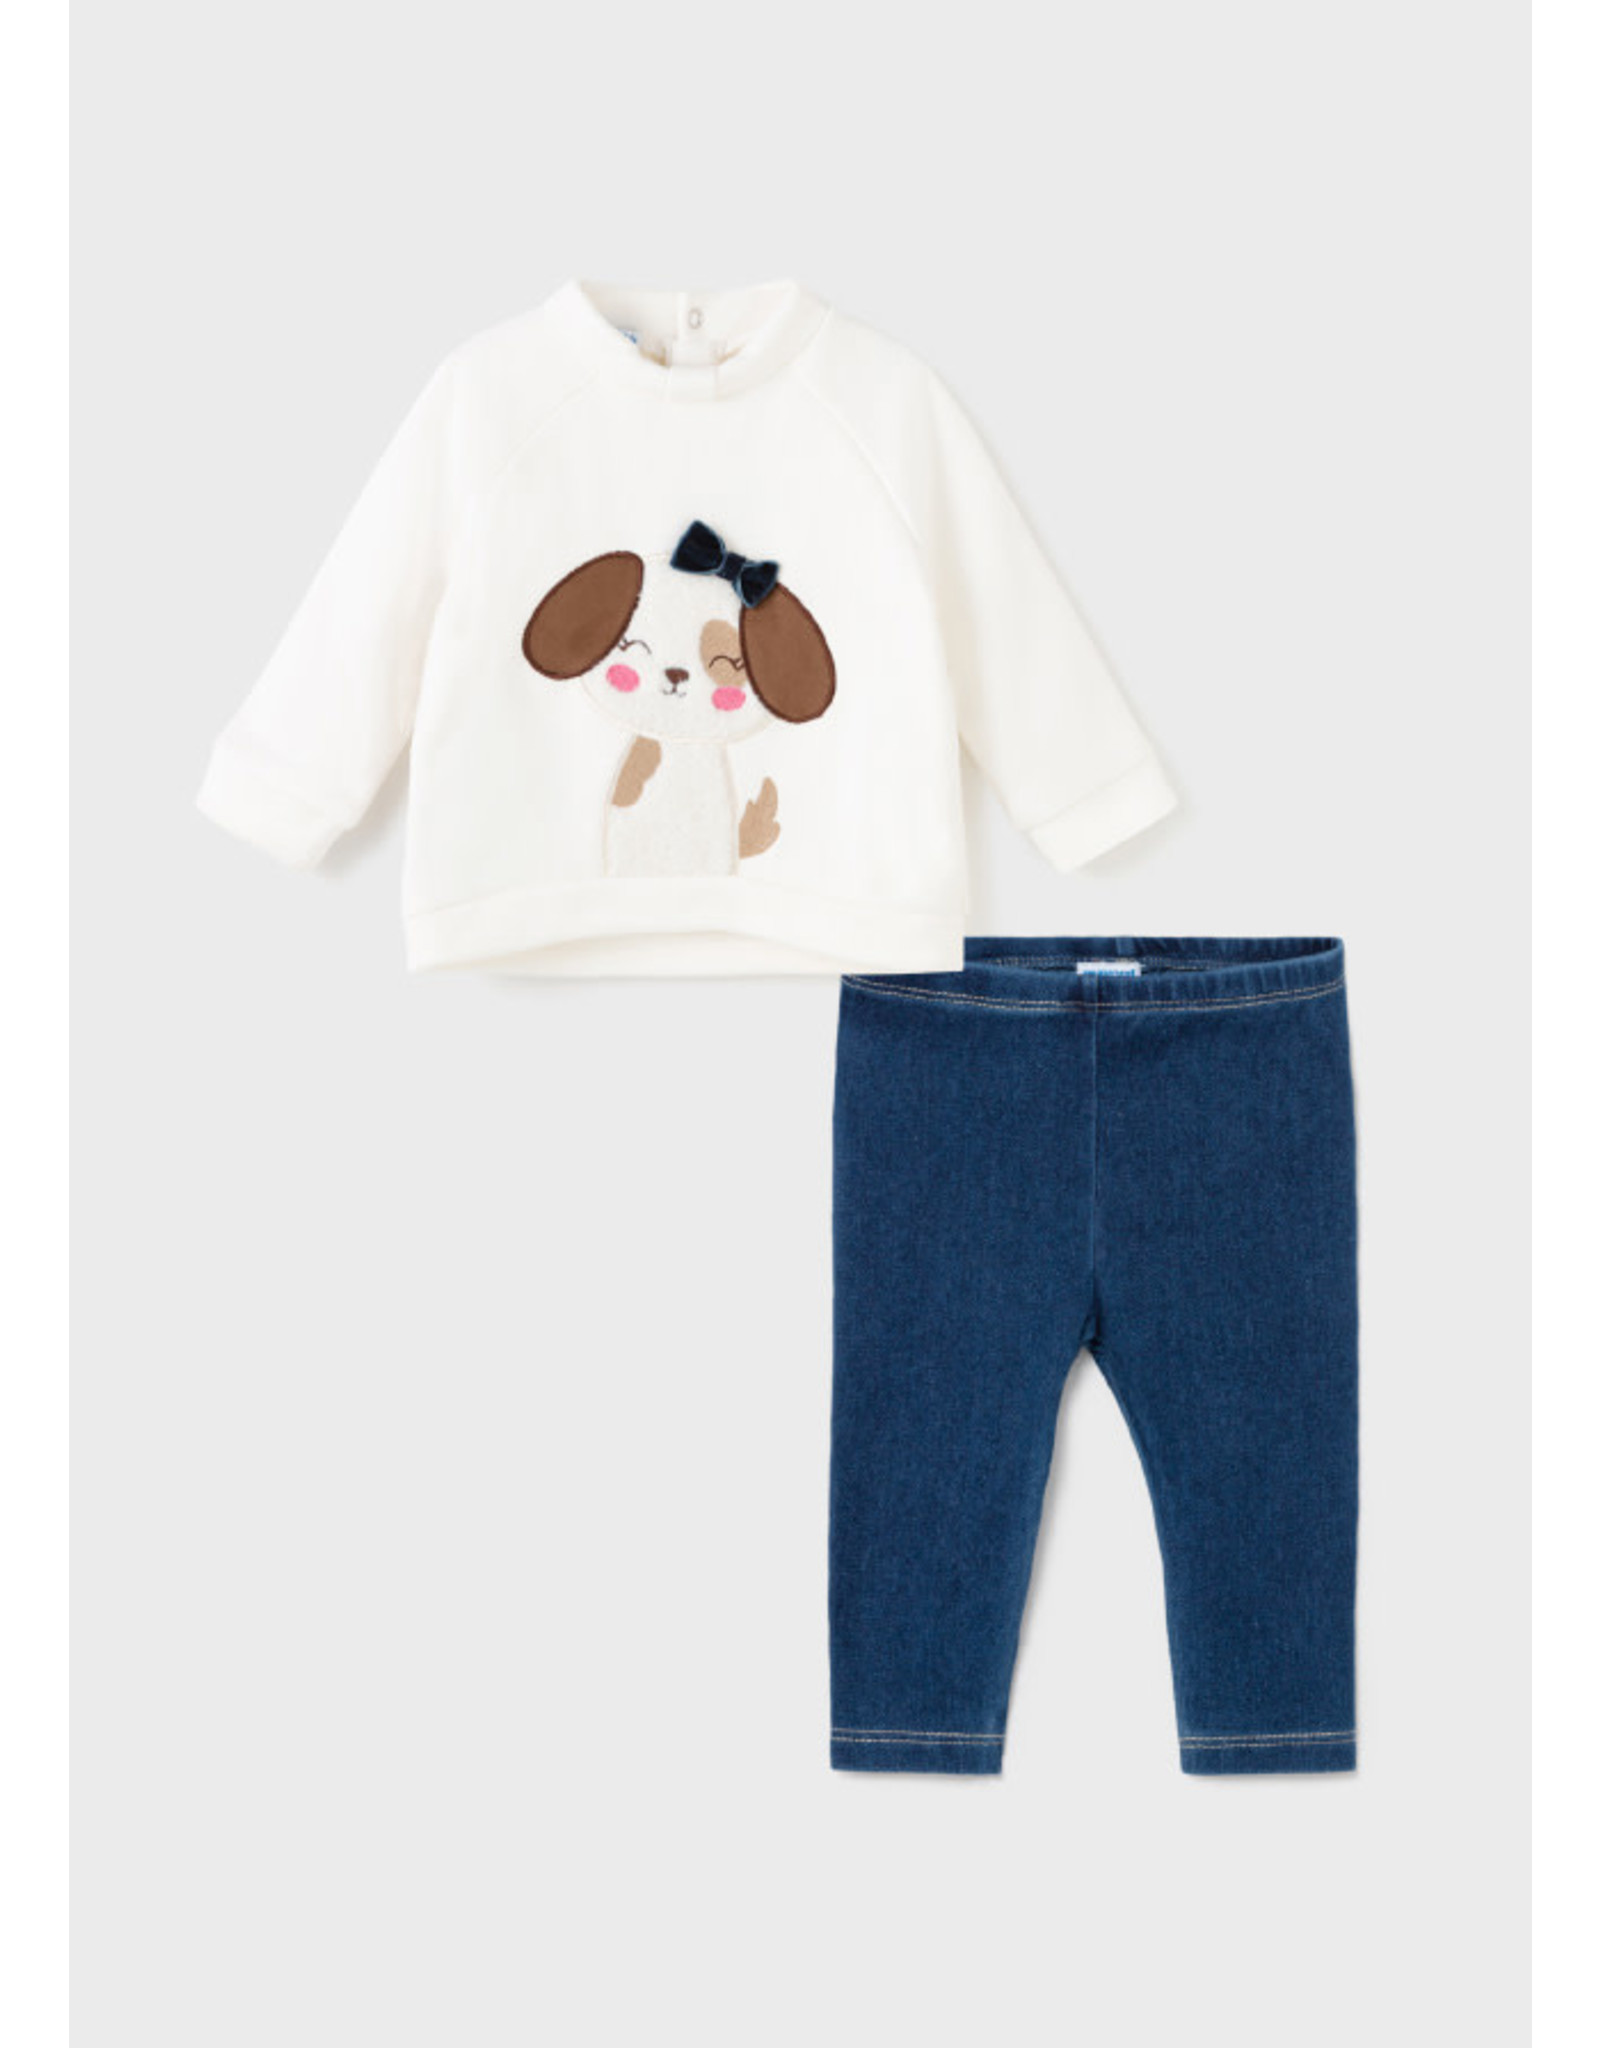 Mayoral Dog Shirt and Natural Denim Leggings set